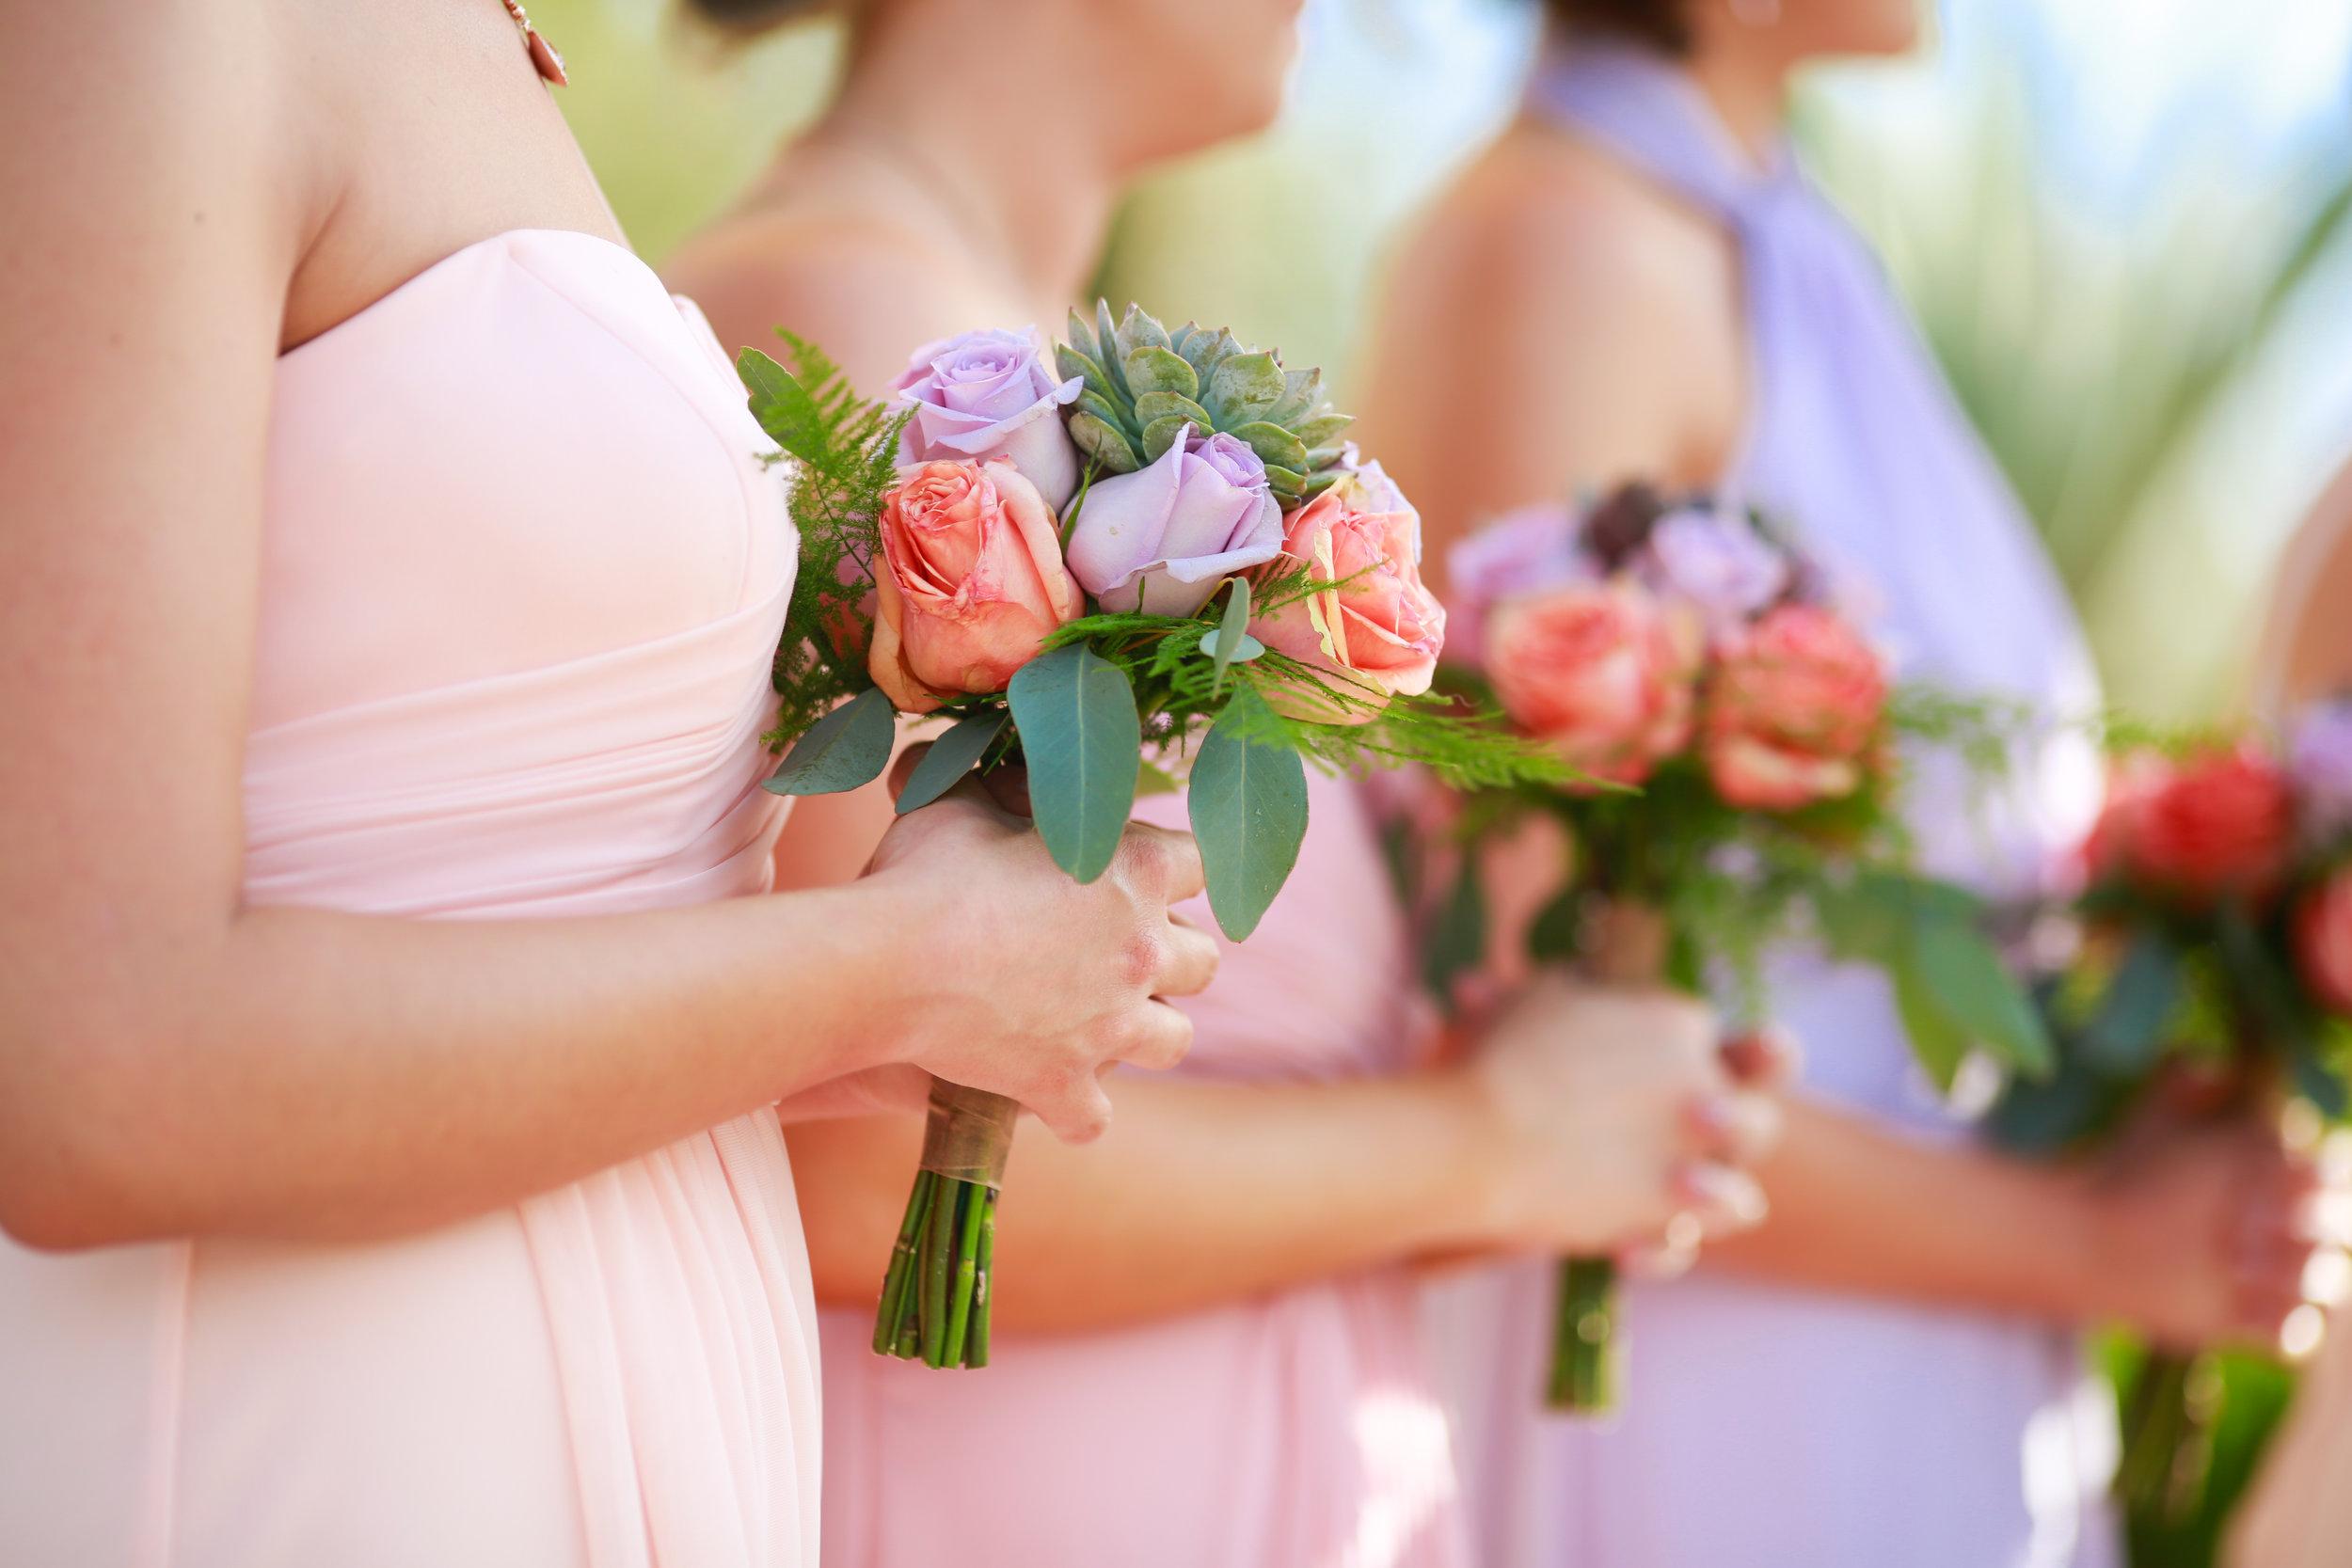 13 brides maids pink brides maid dresses purple bridesmaid dresses pink and purple rose bouquet bridesmaid bouquets spring bouquets Mod Wed Photography Life Design Events .jpg